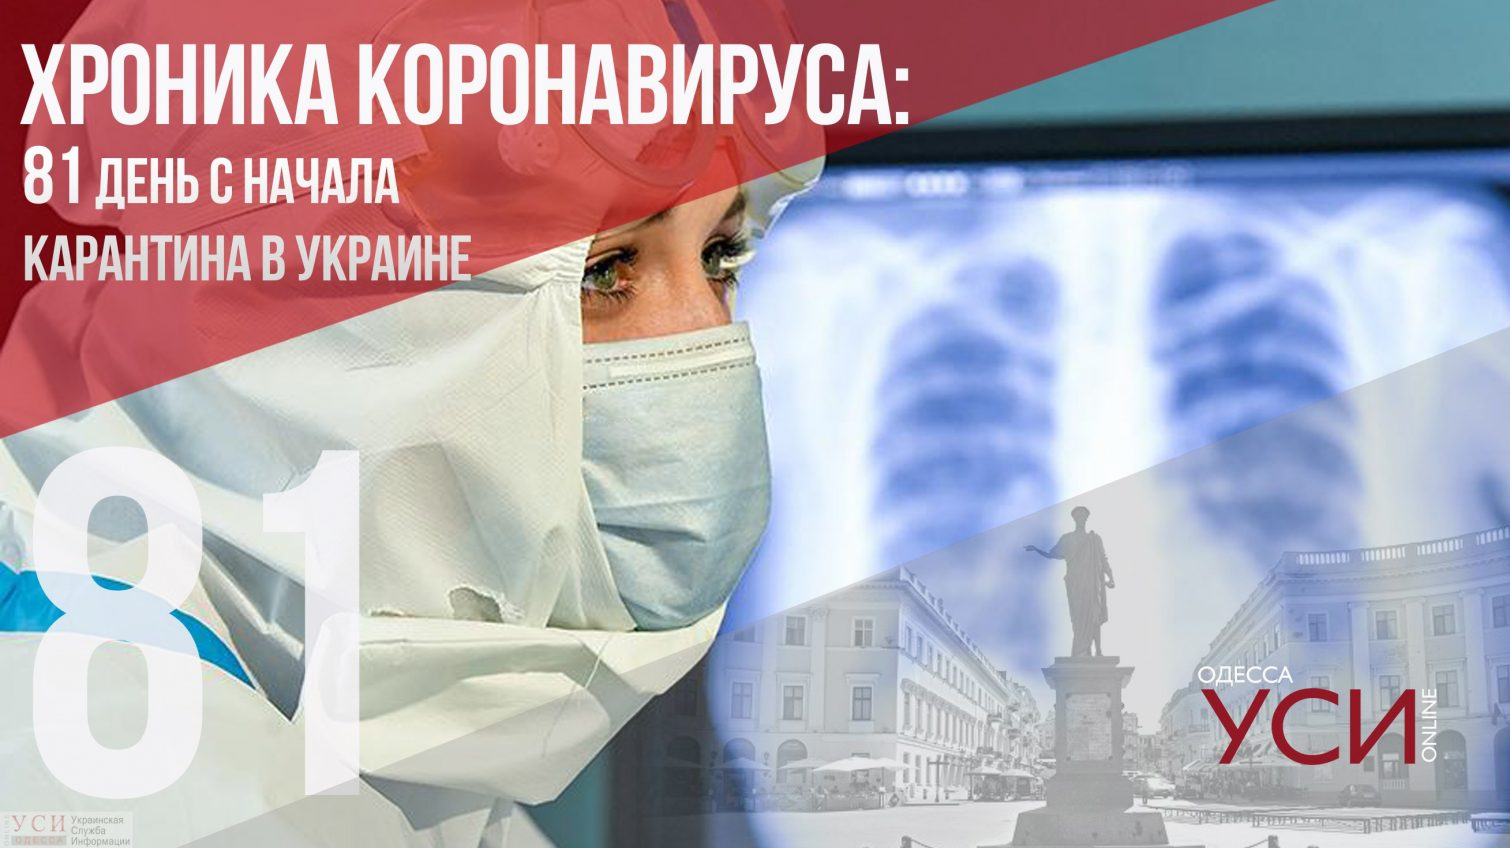 Хроника коронавируса: 81 день с начала карантина в Украине «фото»